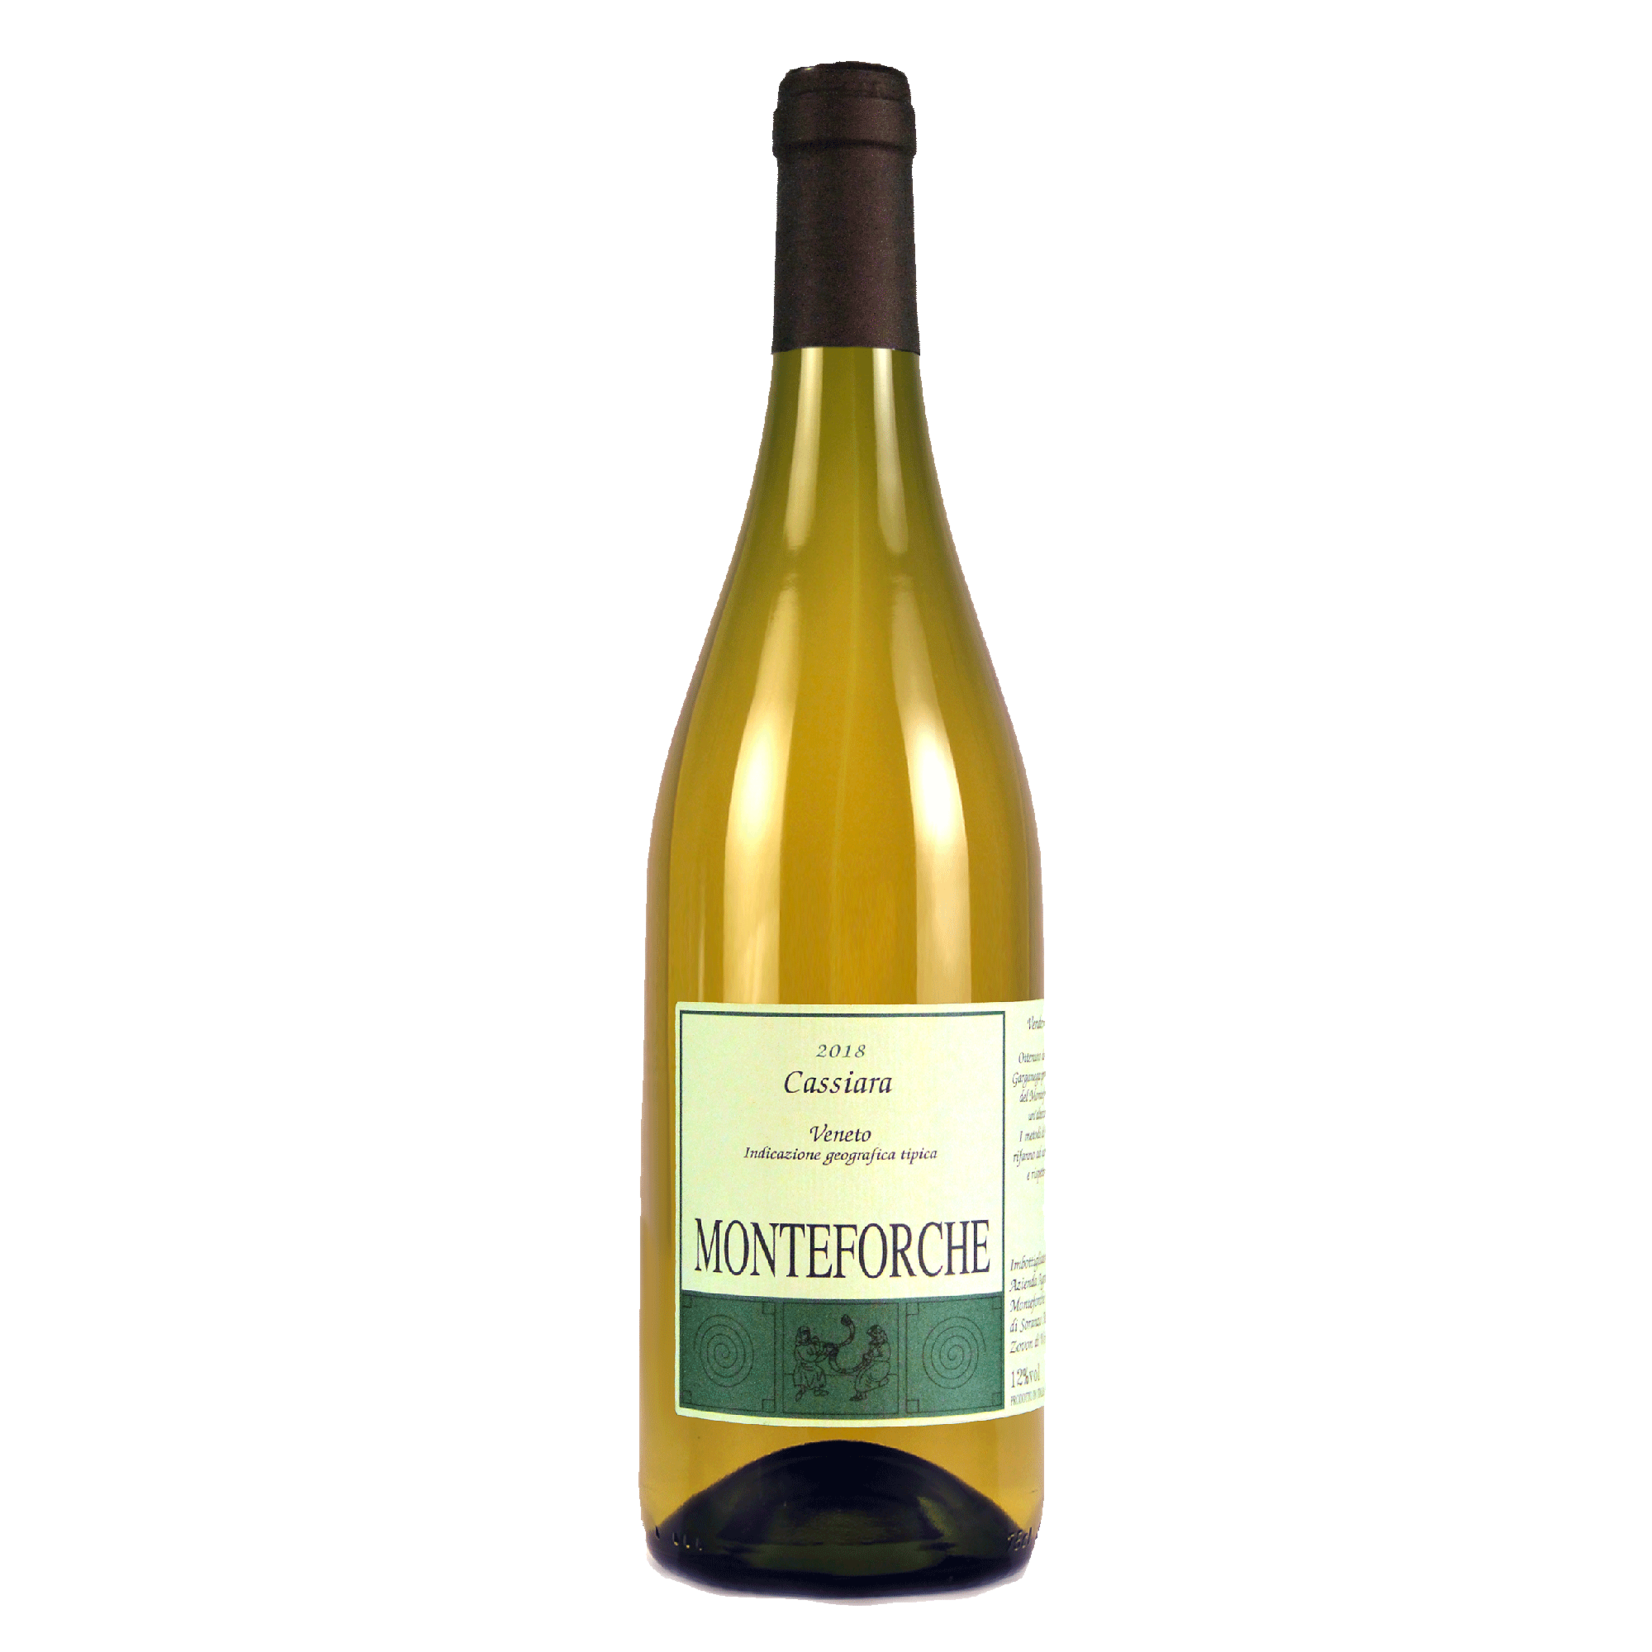 Wine Monteforche Cassiara 2018